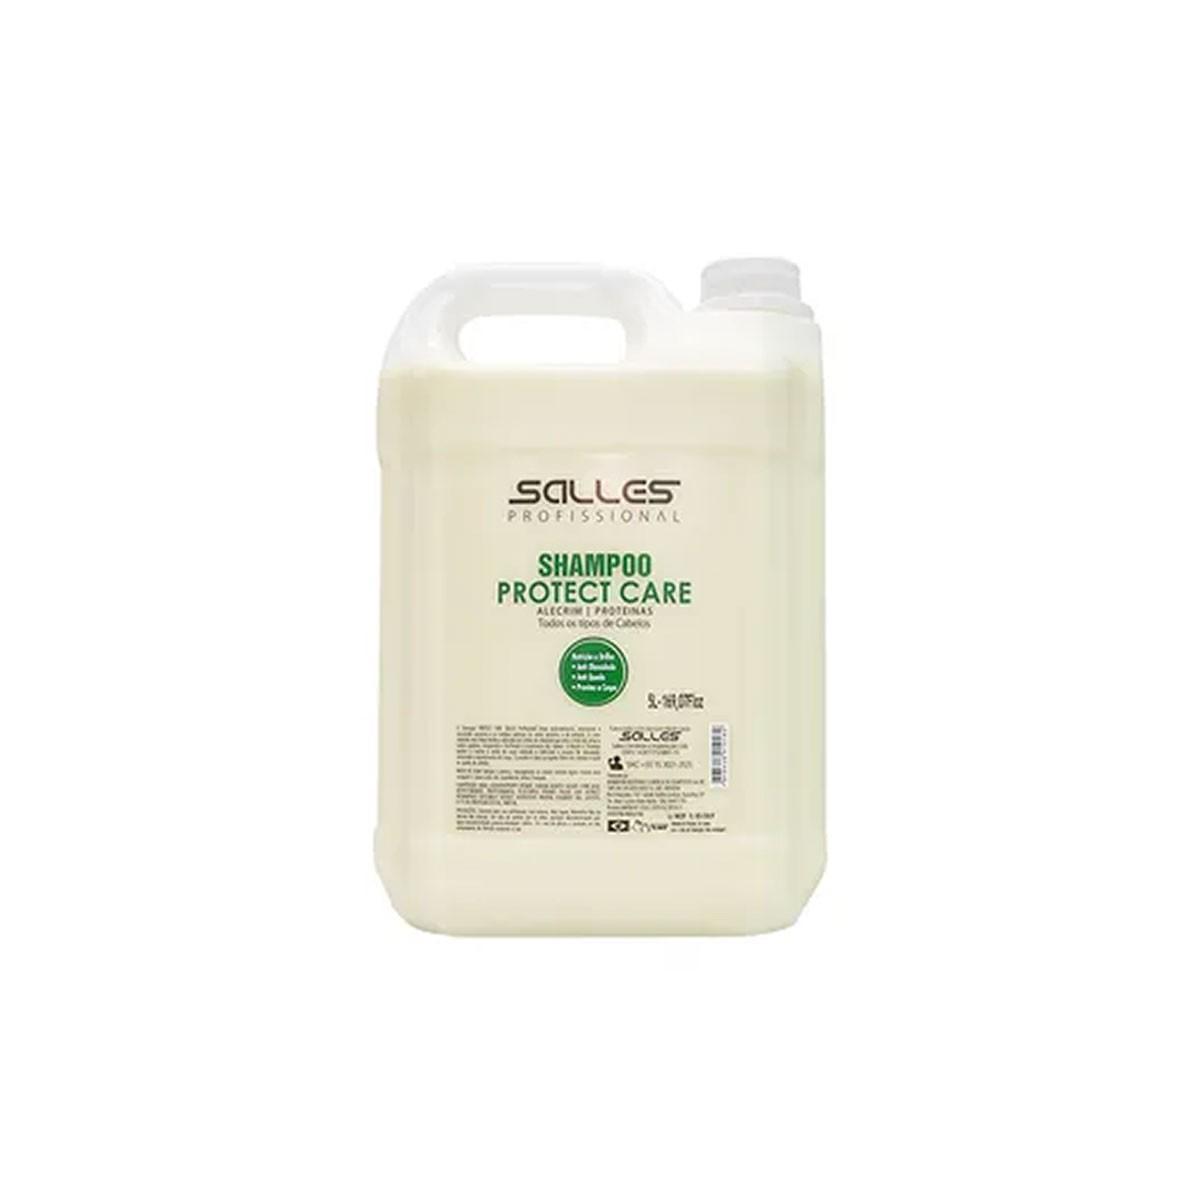 Shampoo Protect Care - Salles Profissional